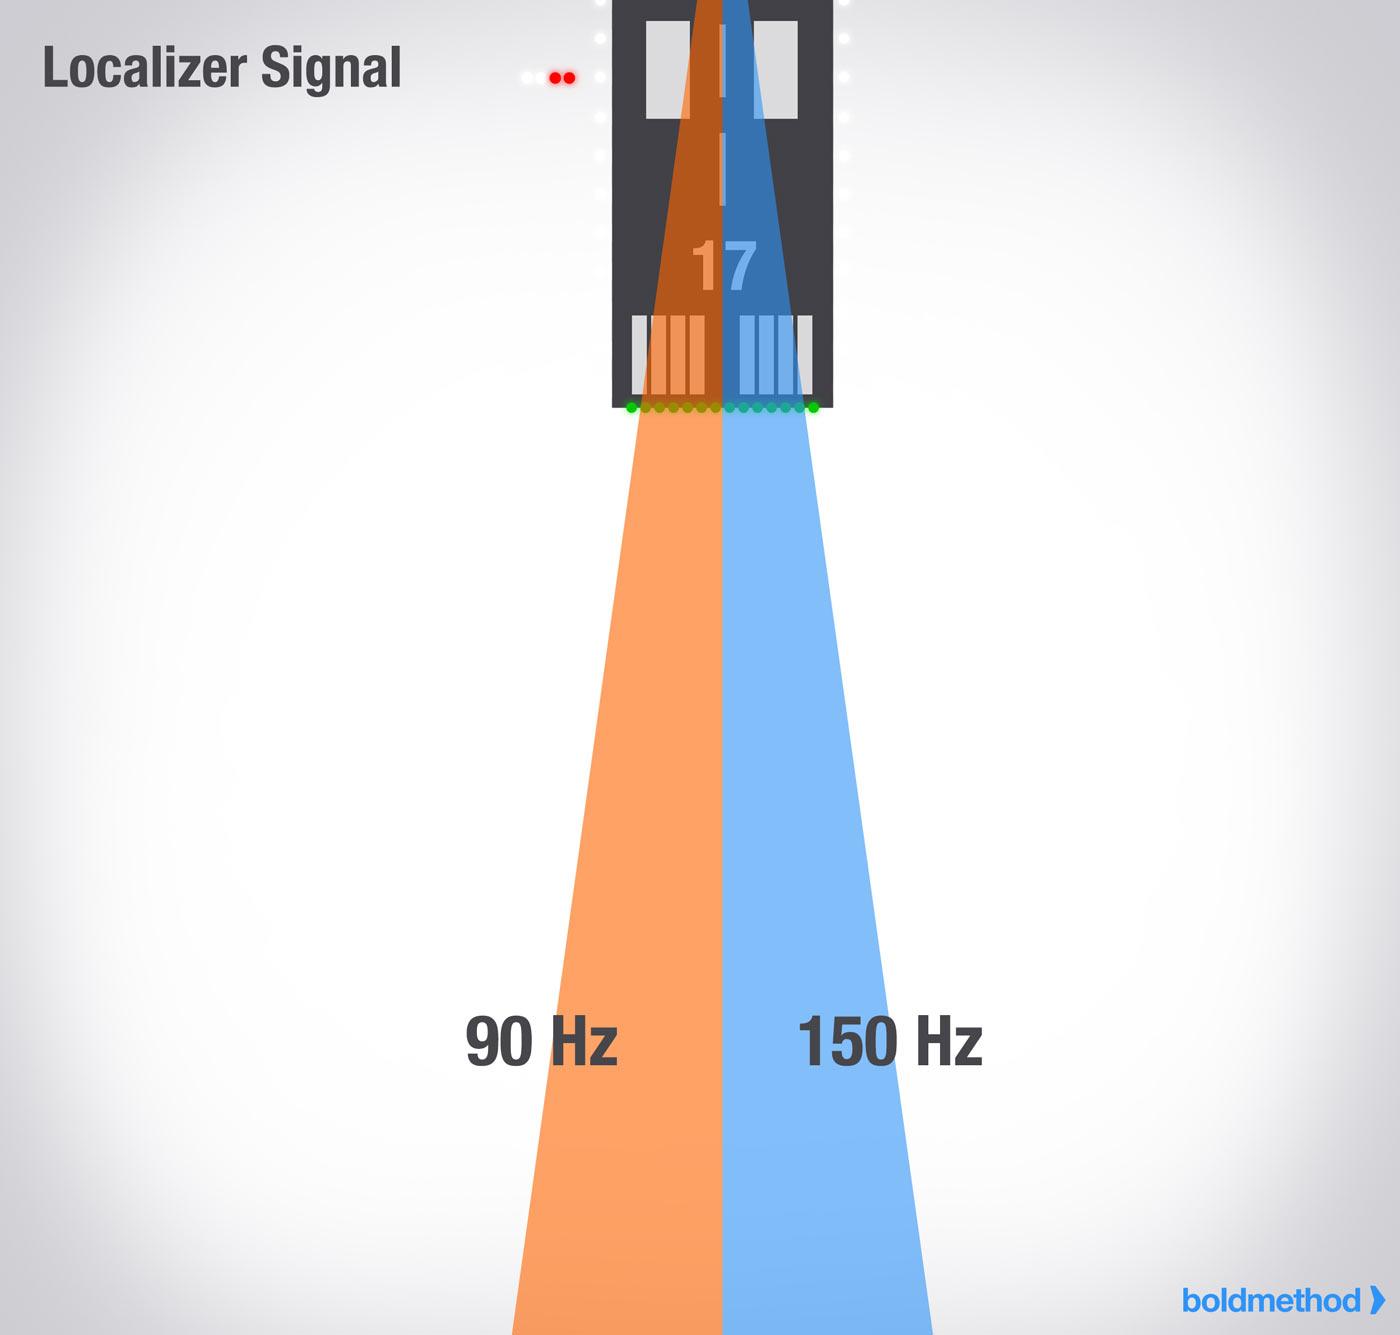 boldmethod.com on the localizer signal